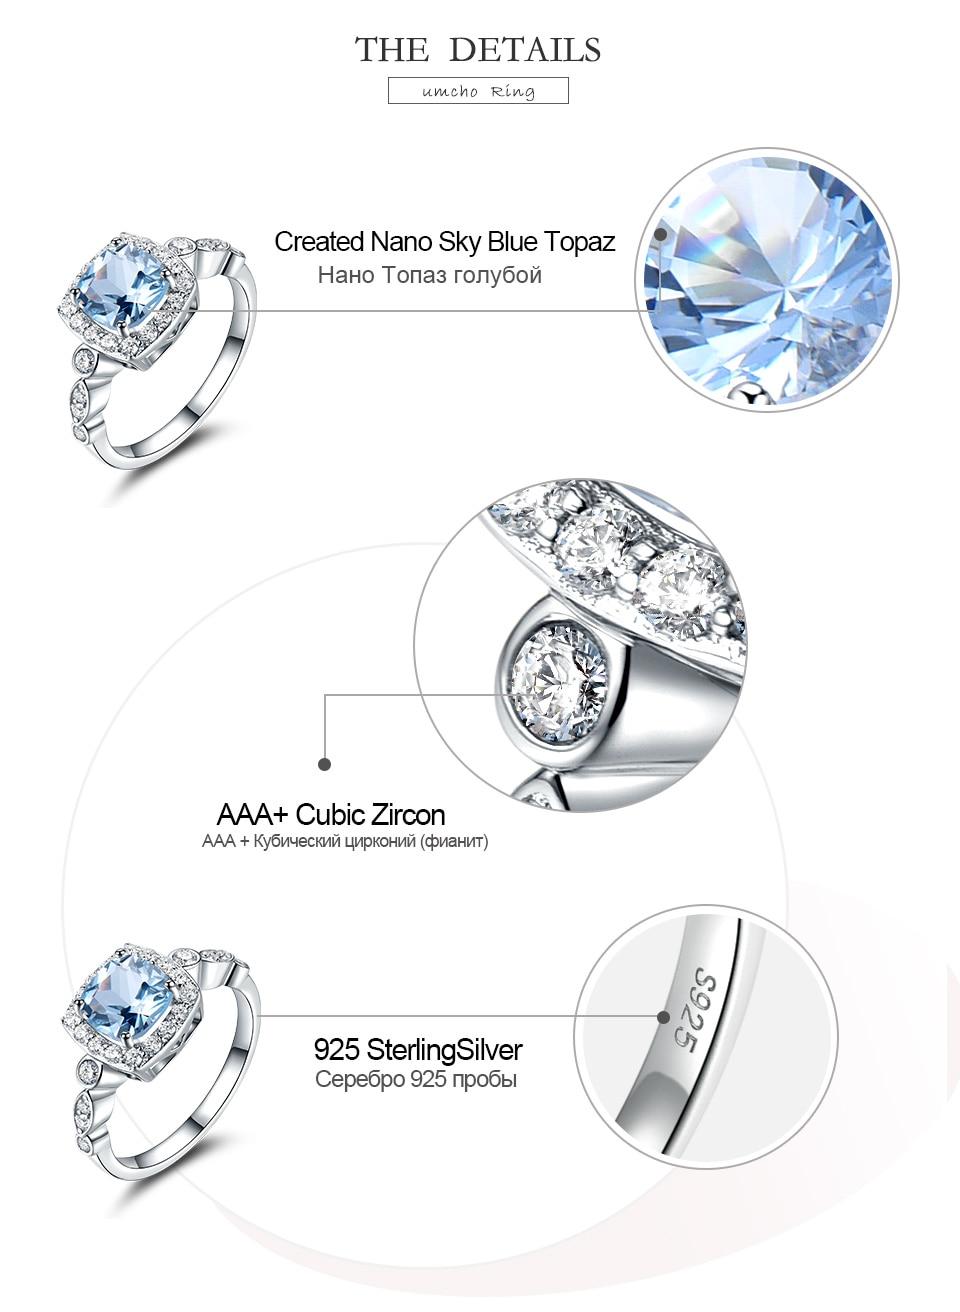 HTB1WIW1ev1H3KVjSZFBq6zSMXXaH - UMCHO  Real S925 Sterling Silver Rings for Women Blue Topaz Ring Gemstone